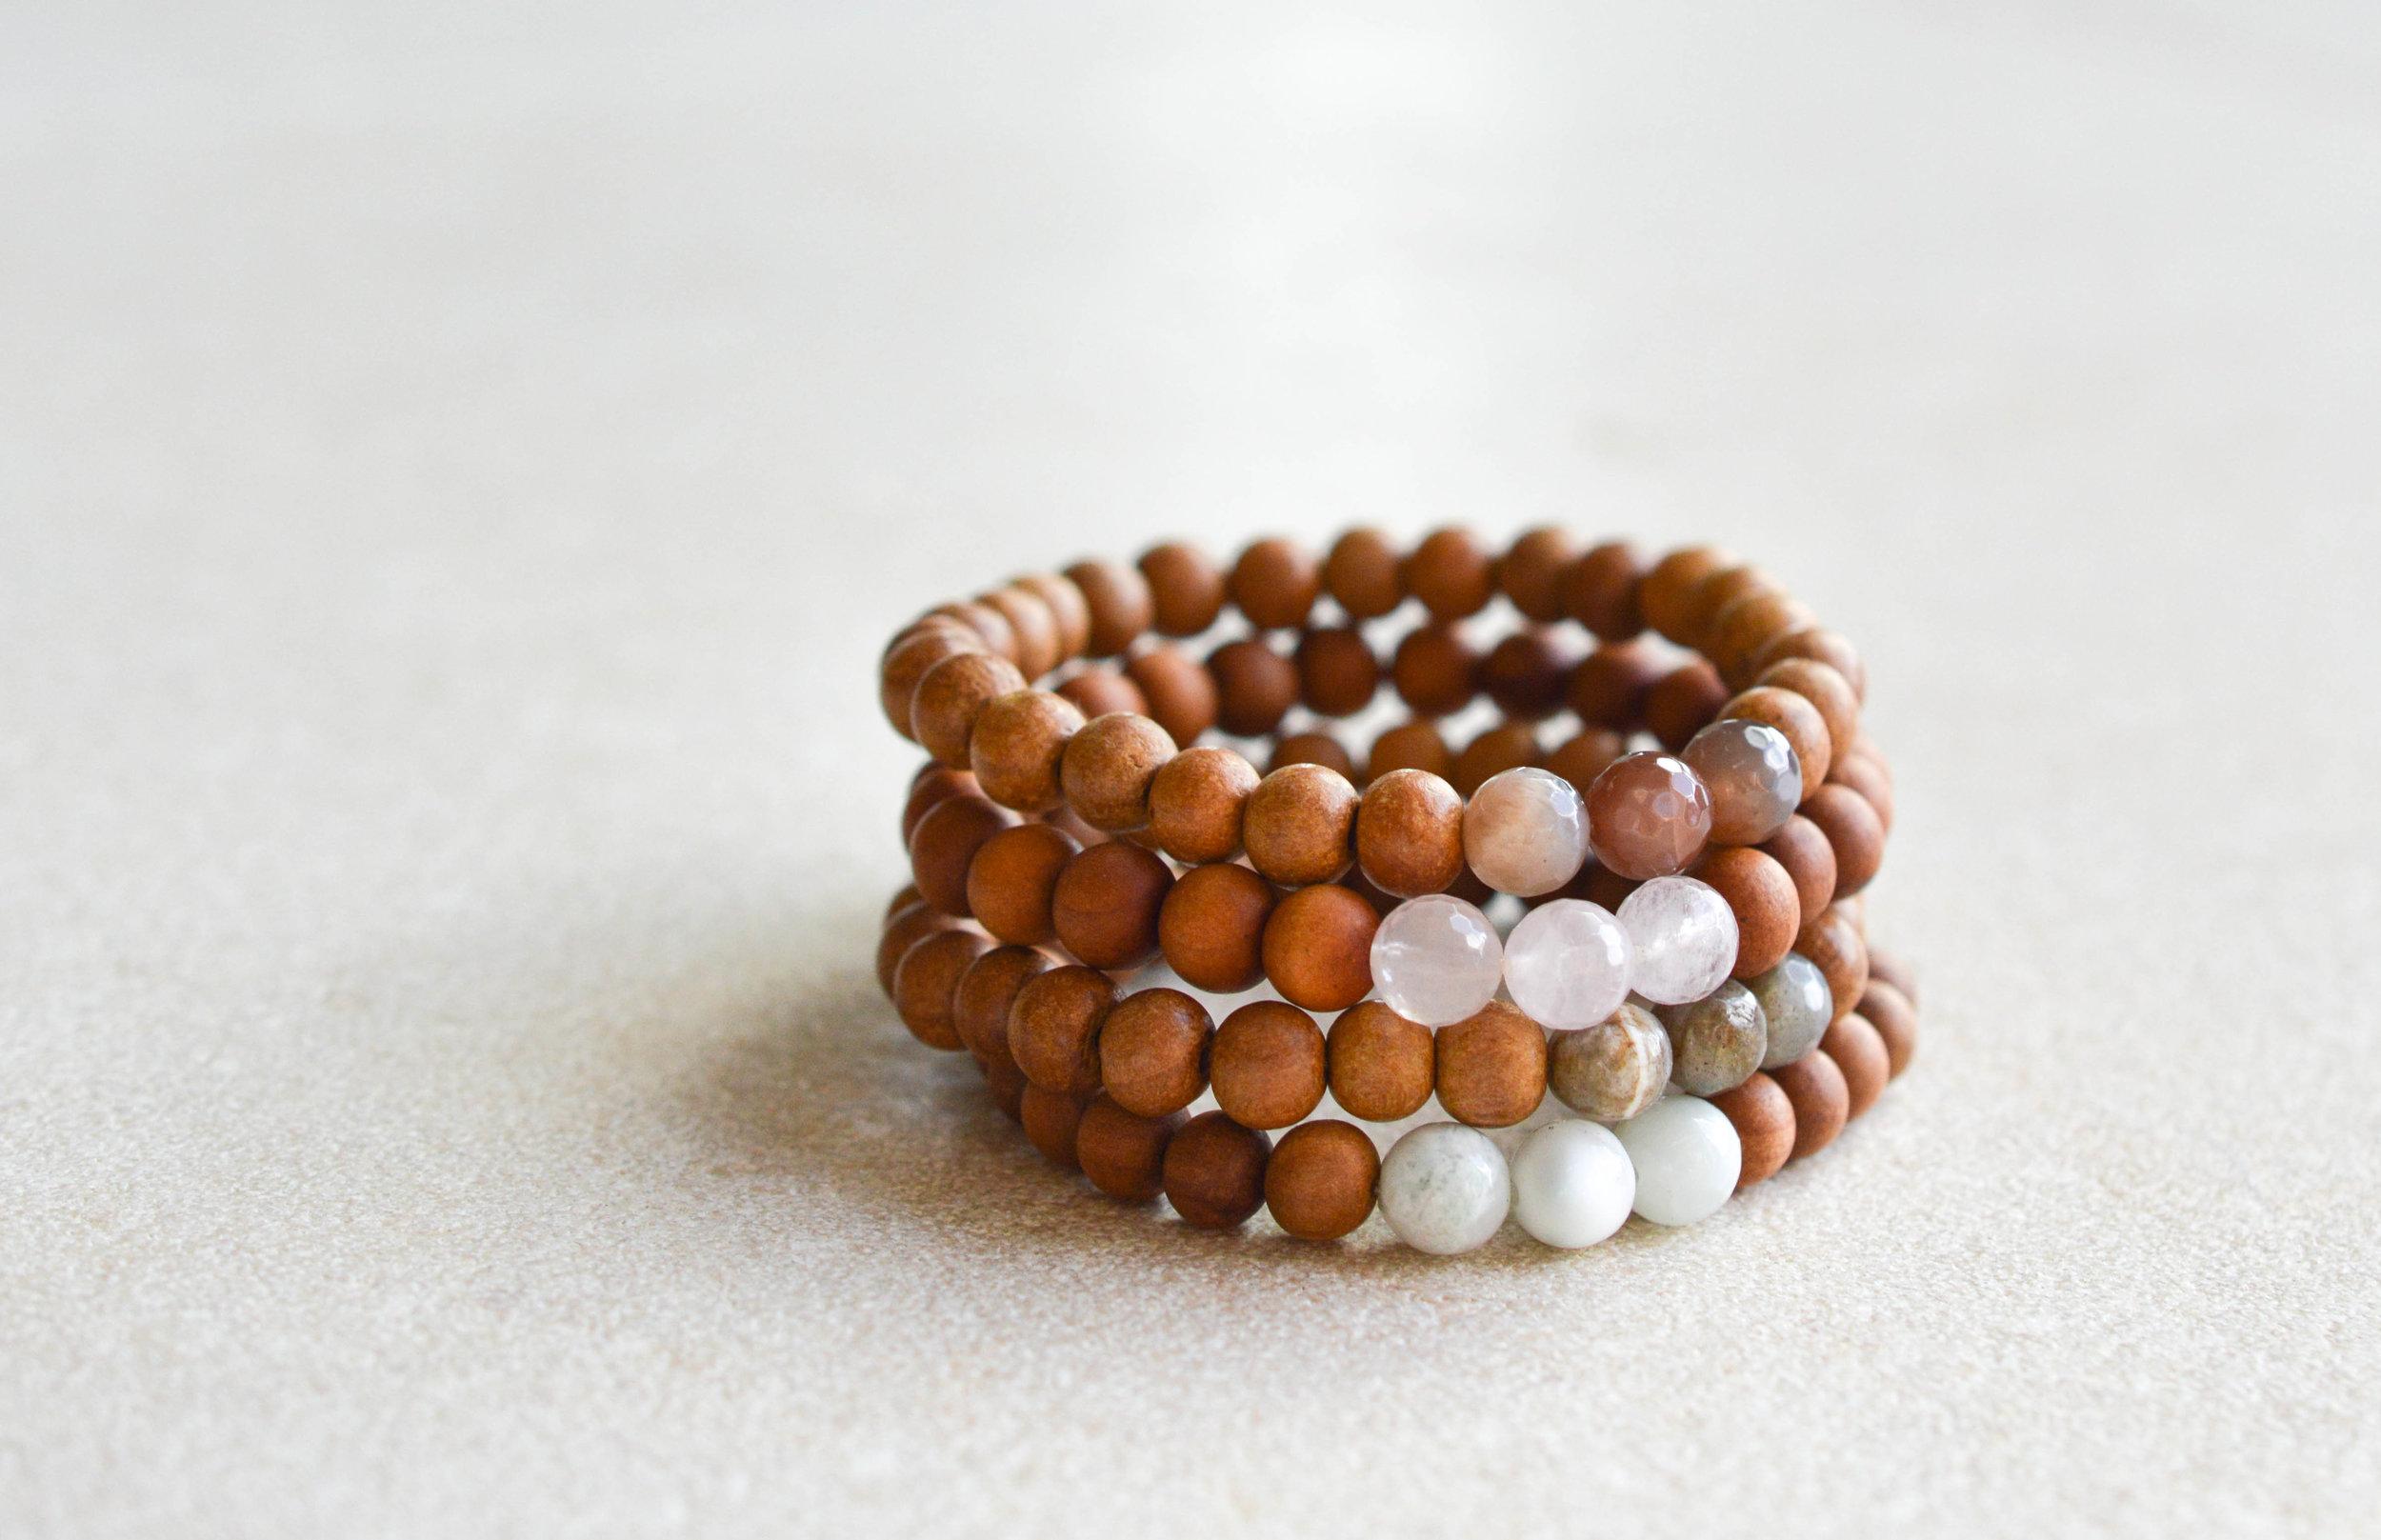 sandalwood-beads-gemstone-bracelet-twenty7-the-jewelry-project-elizabeth-irvine-truewellbeing.jpg